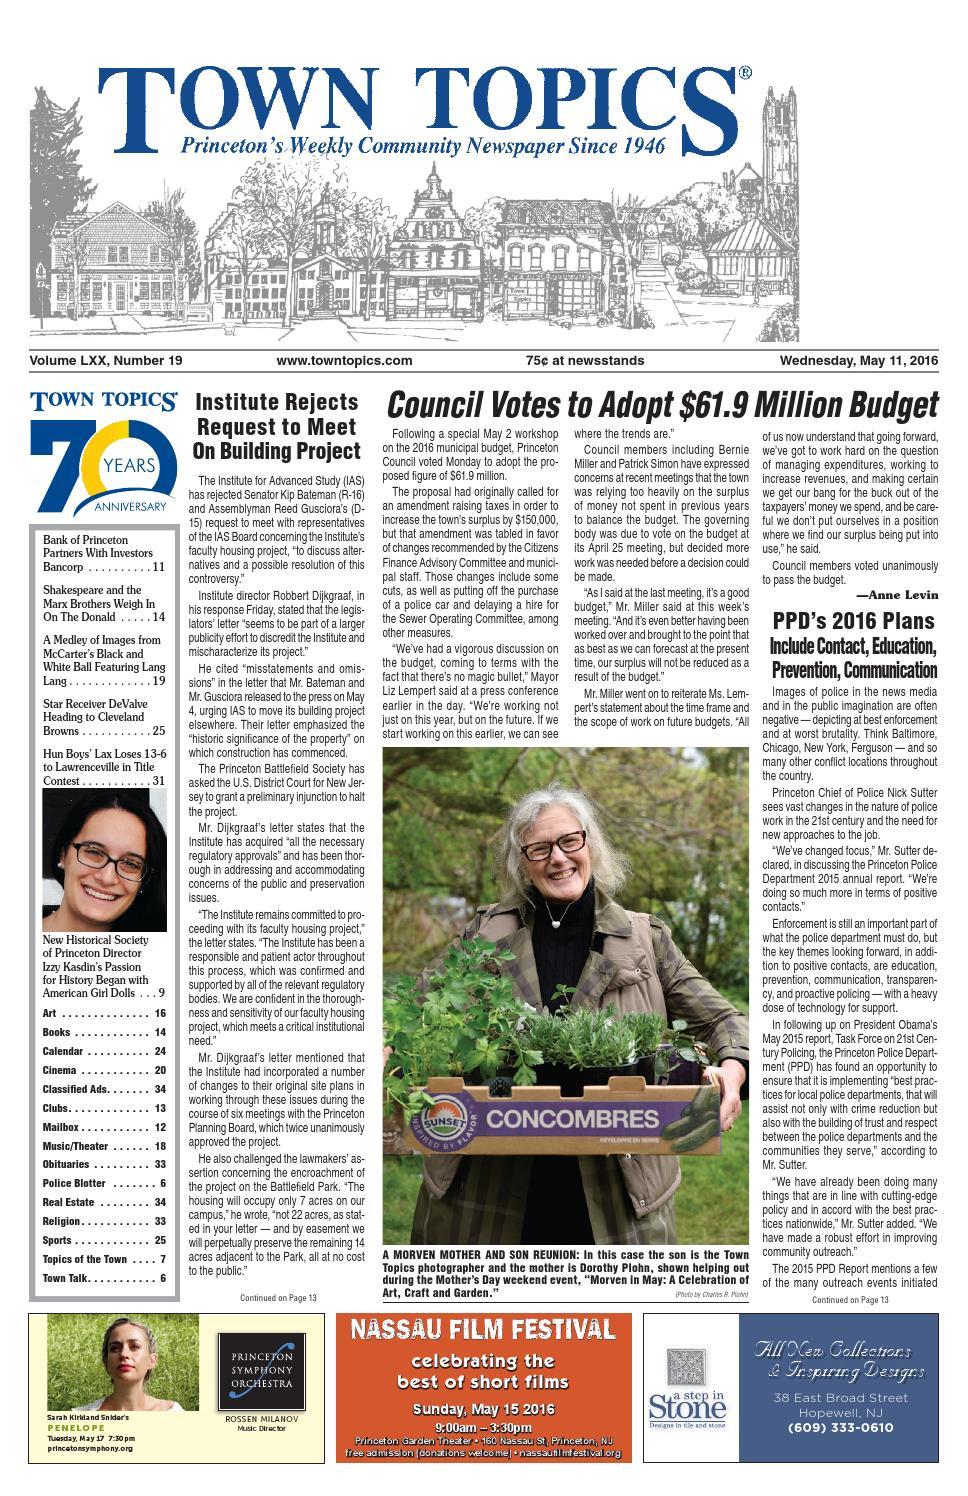 Town Topics Newspaper May 11, 2016